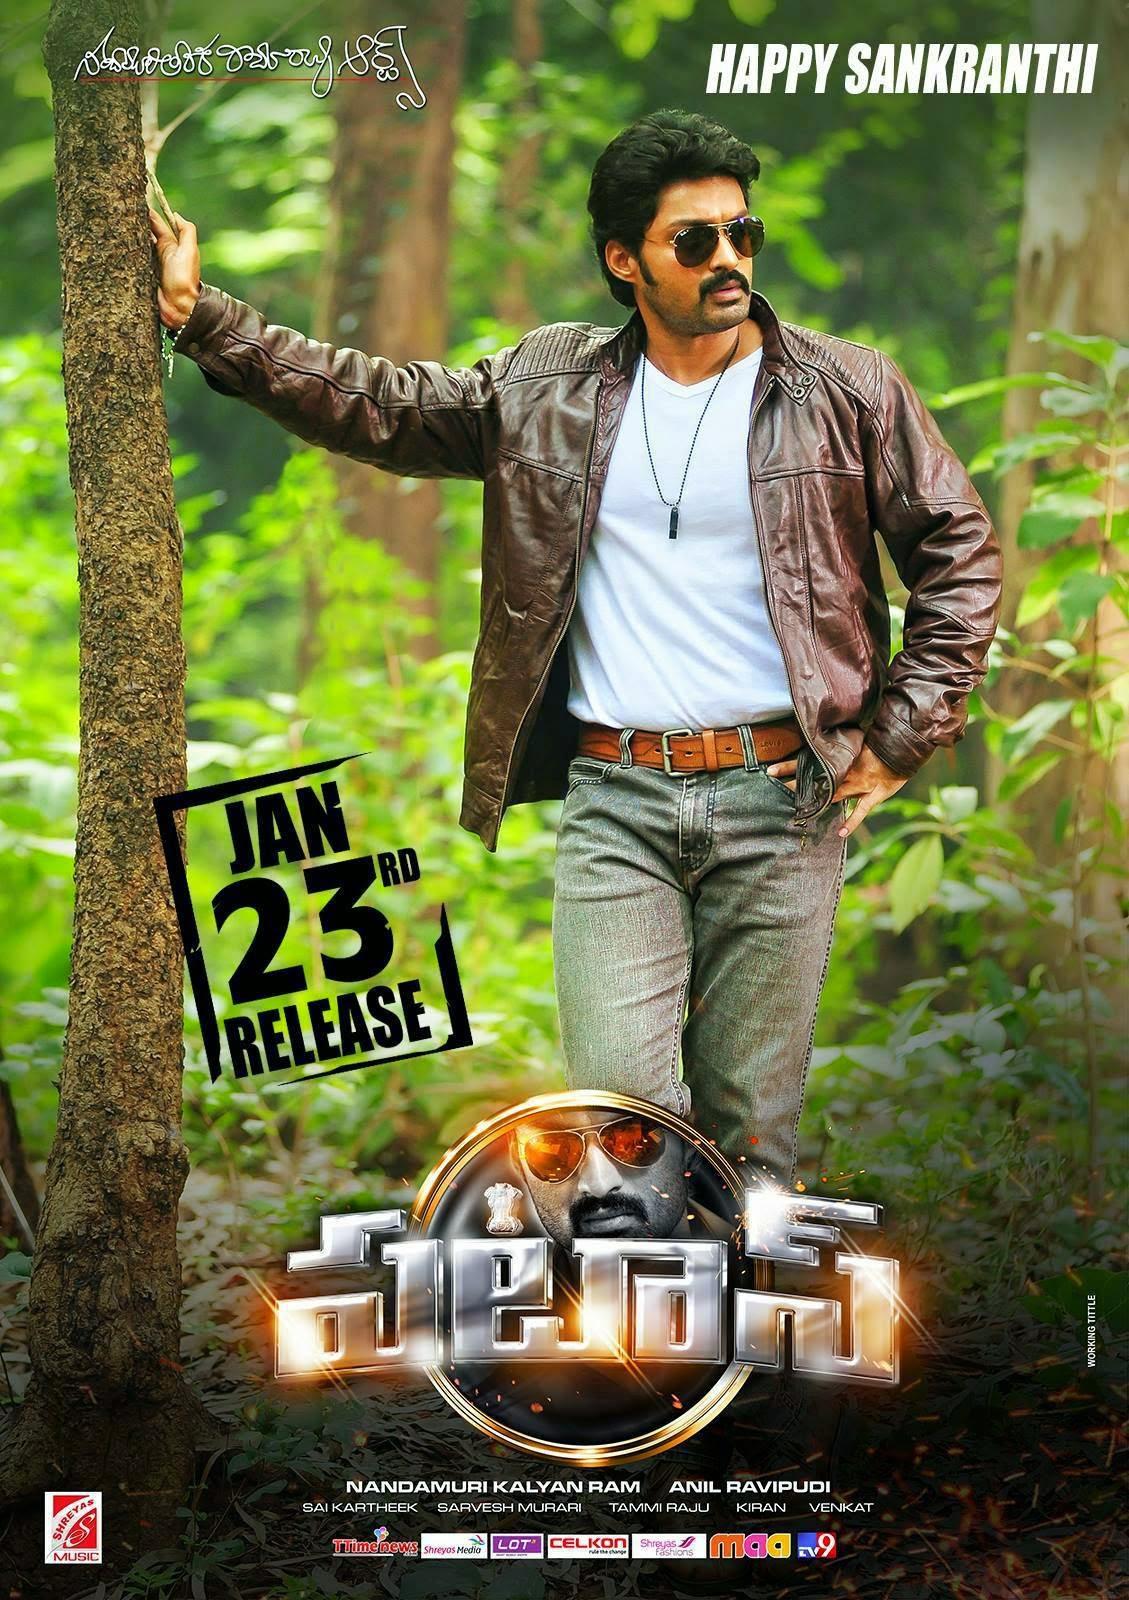 K, Kalyan Ram, Kalyan Ram Photo HD Gallery, latest HD images, Latest wallpapers, Telugu Movie actors, Tollywood, Indian Actors, Kalyan Ram Pataas Telugu Movie HD Posters